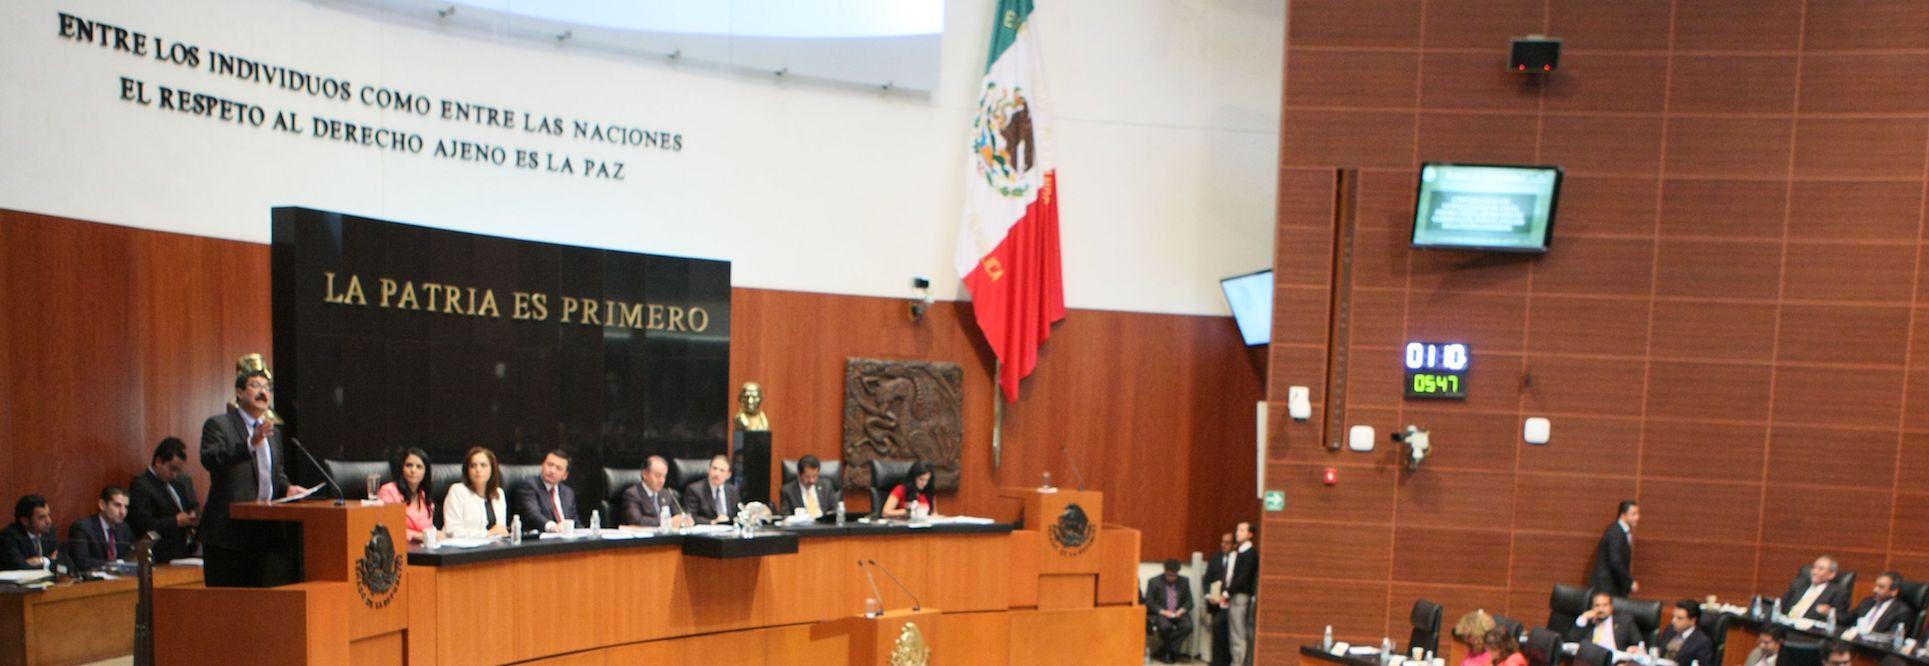 Mexico demands respect